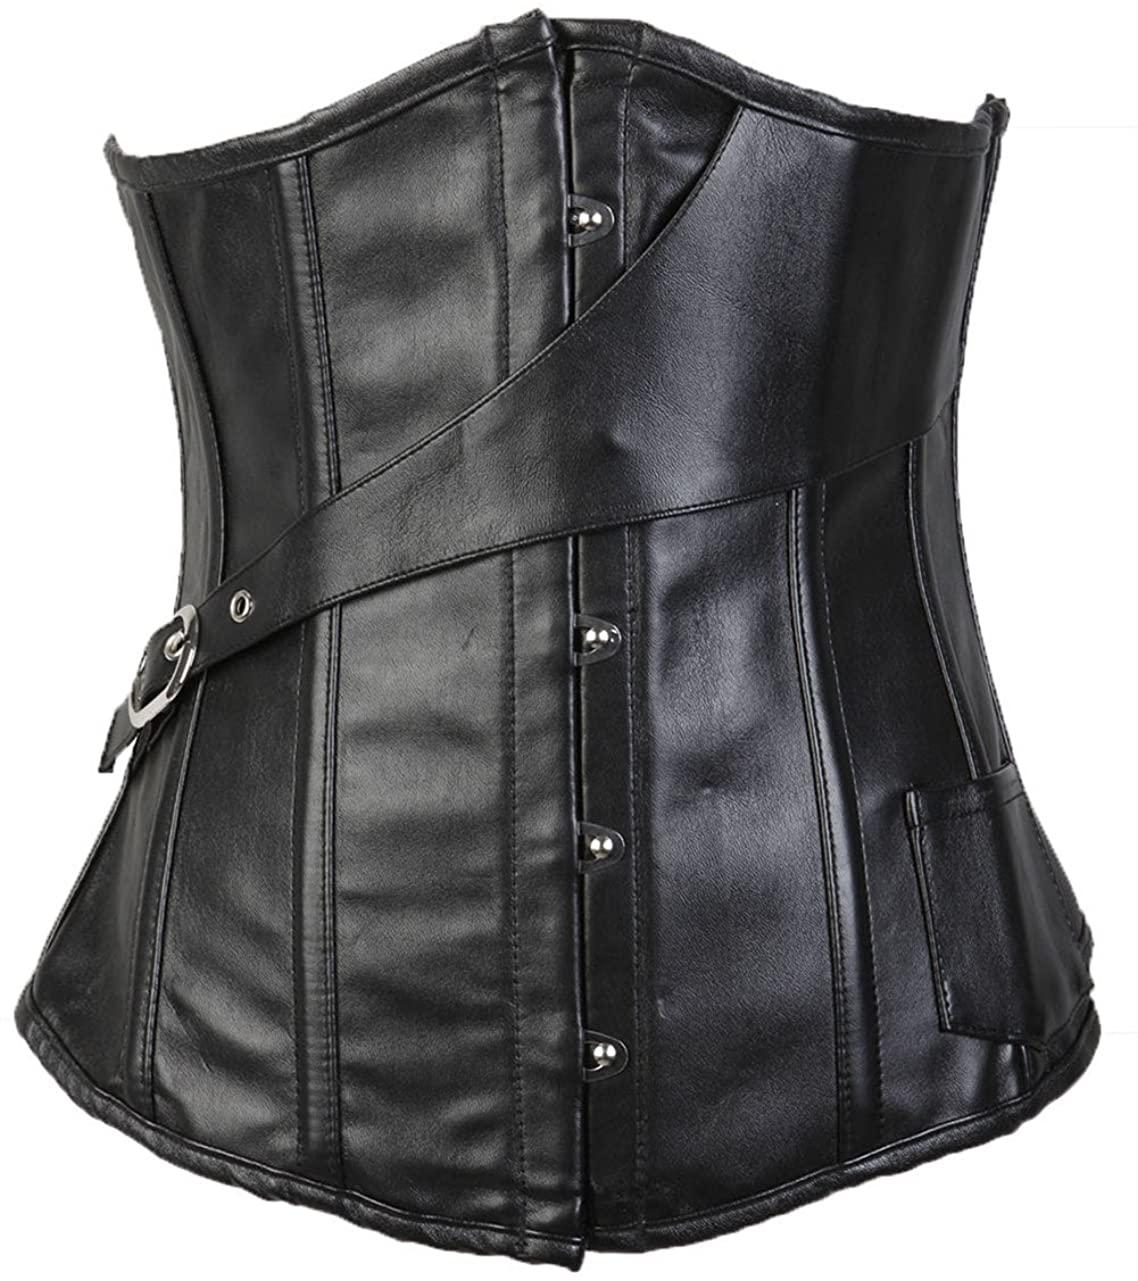 Lotsyle Faux Leather Steampunk Underbust Lace up Back Corset